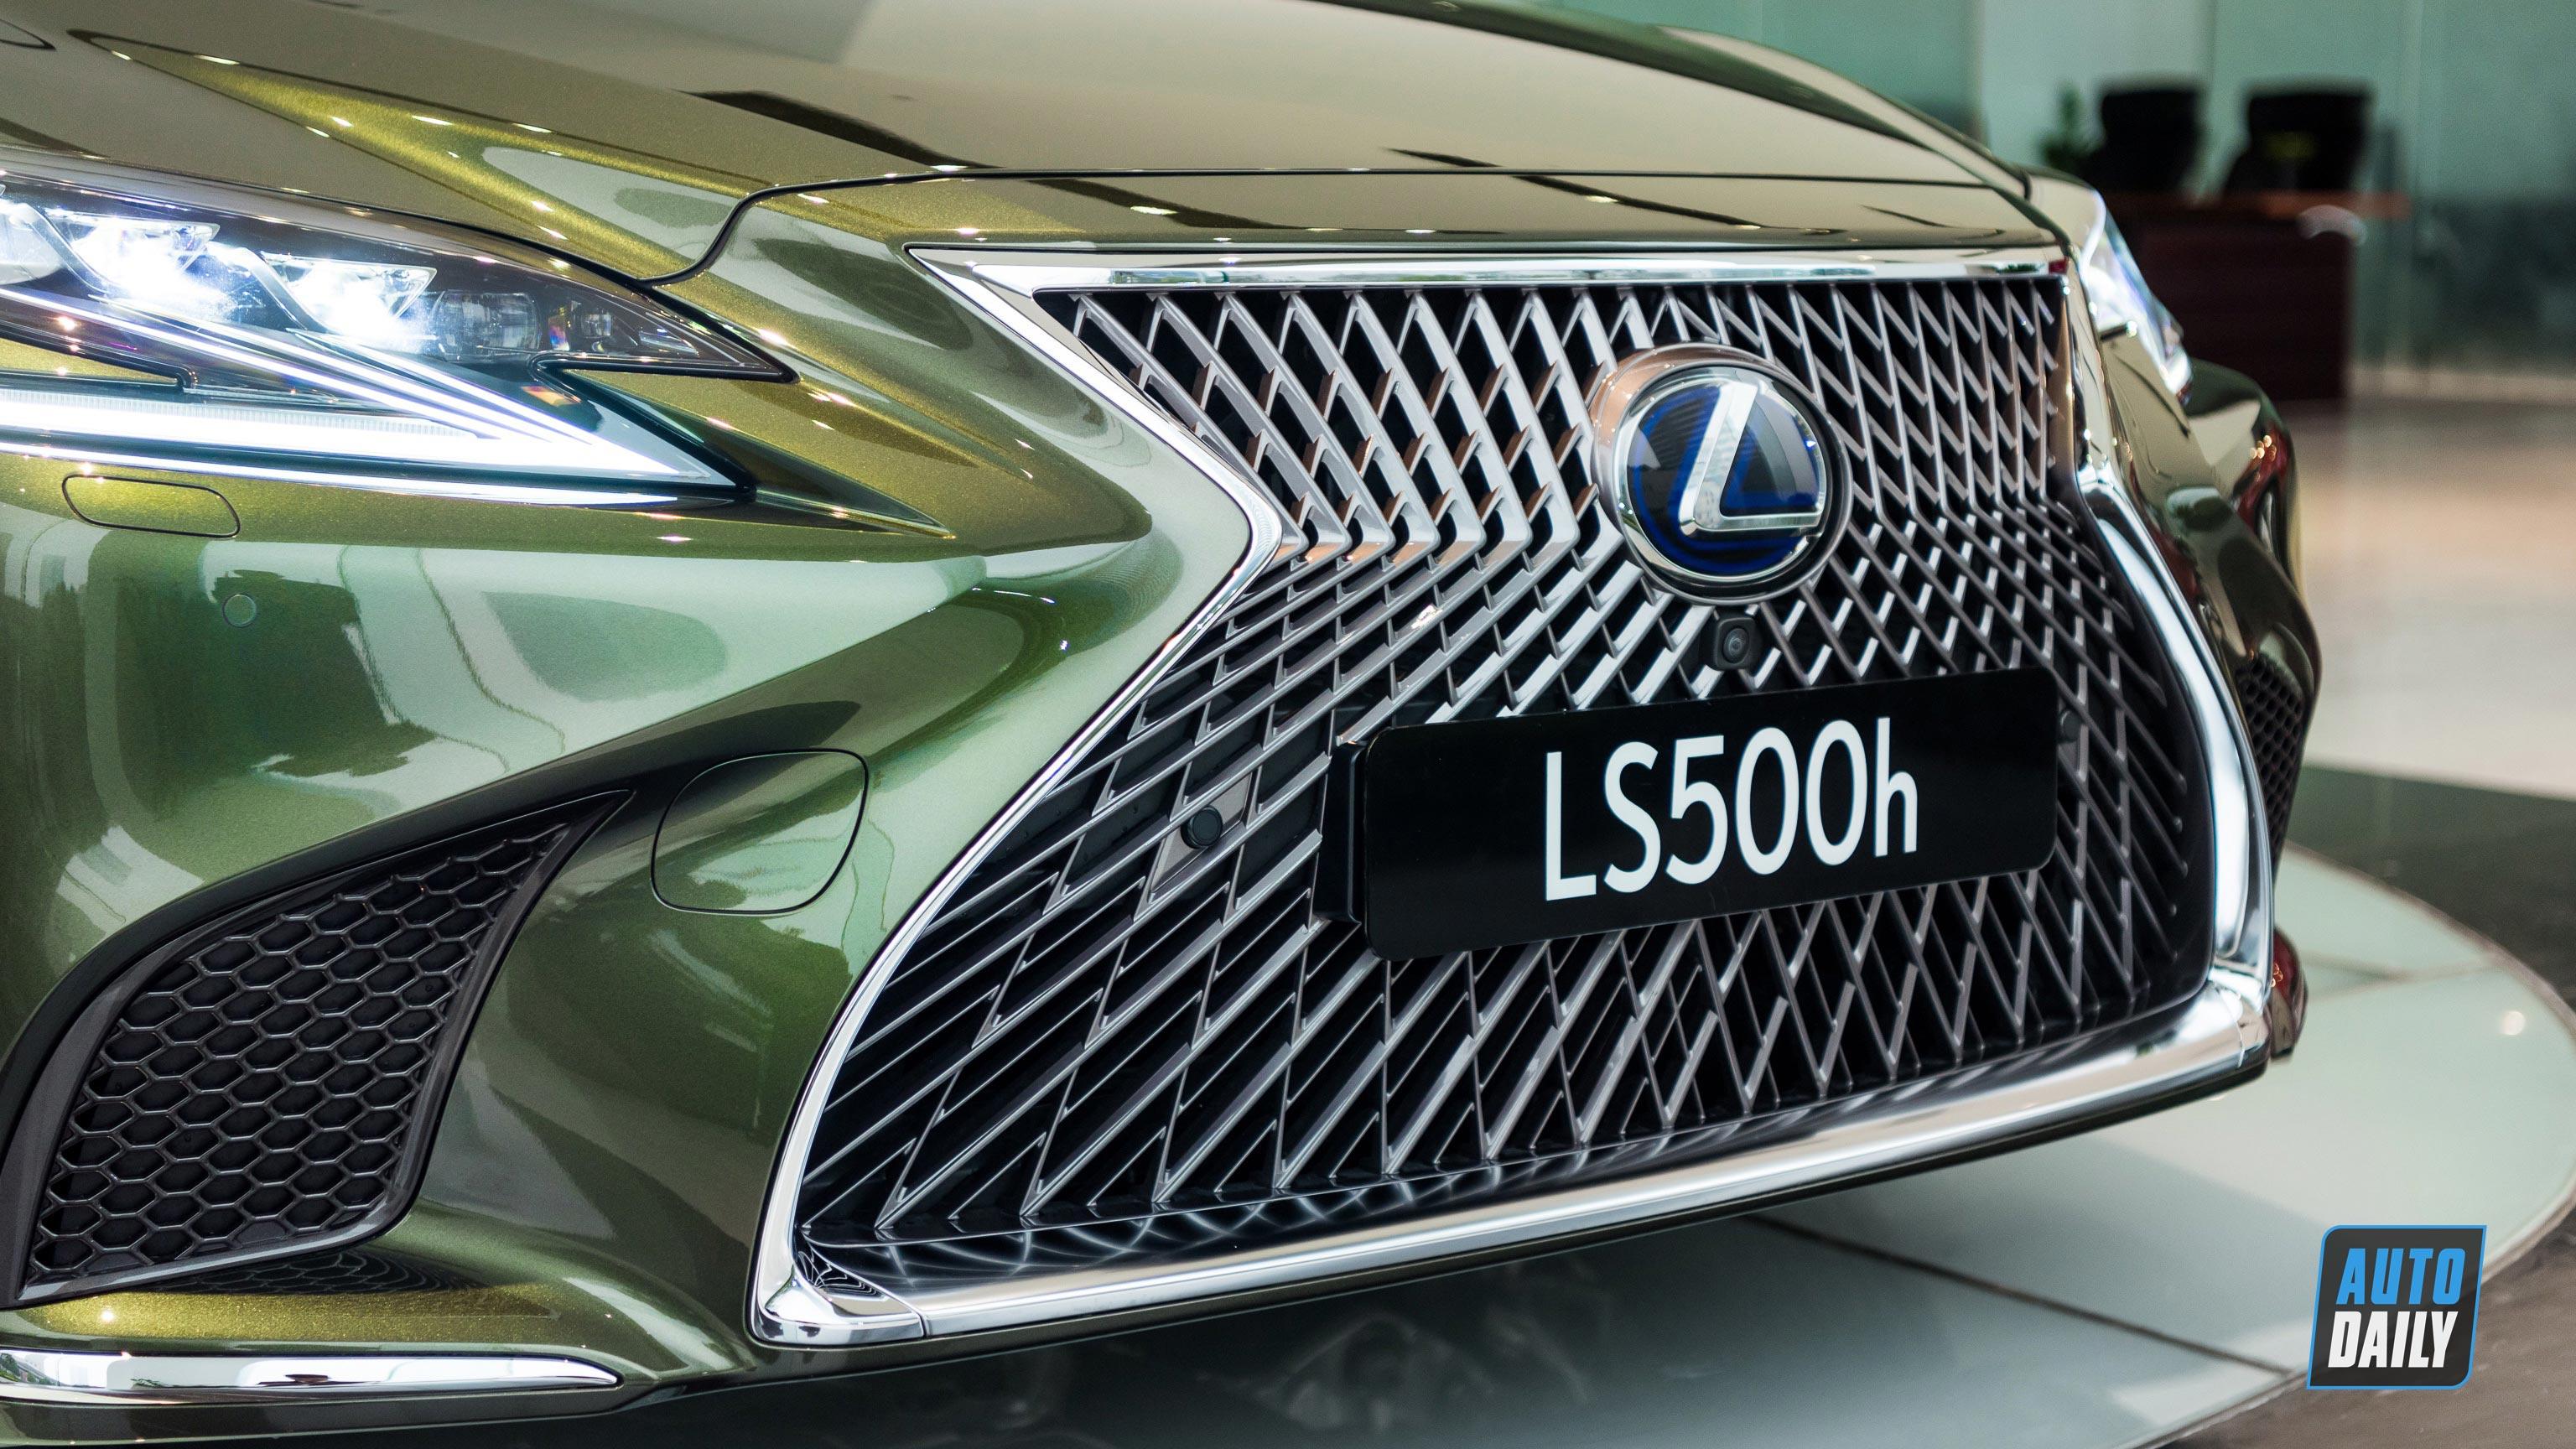 lexus-ls500h-autodaily-010.jpg